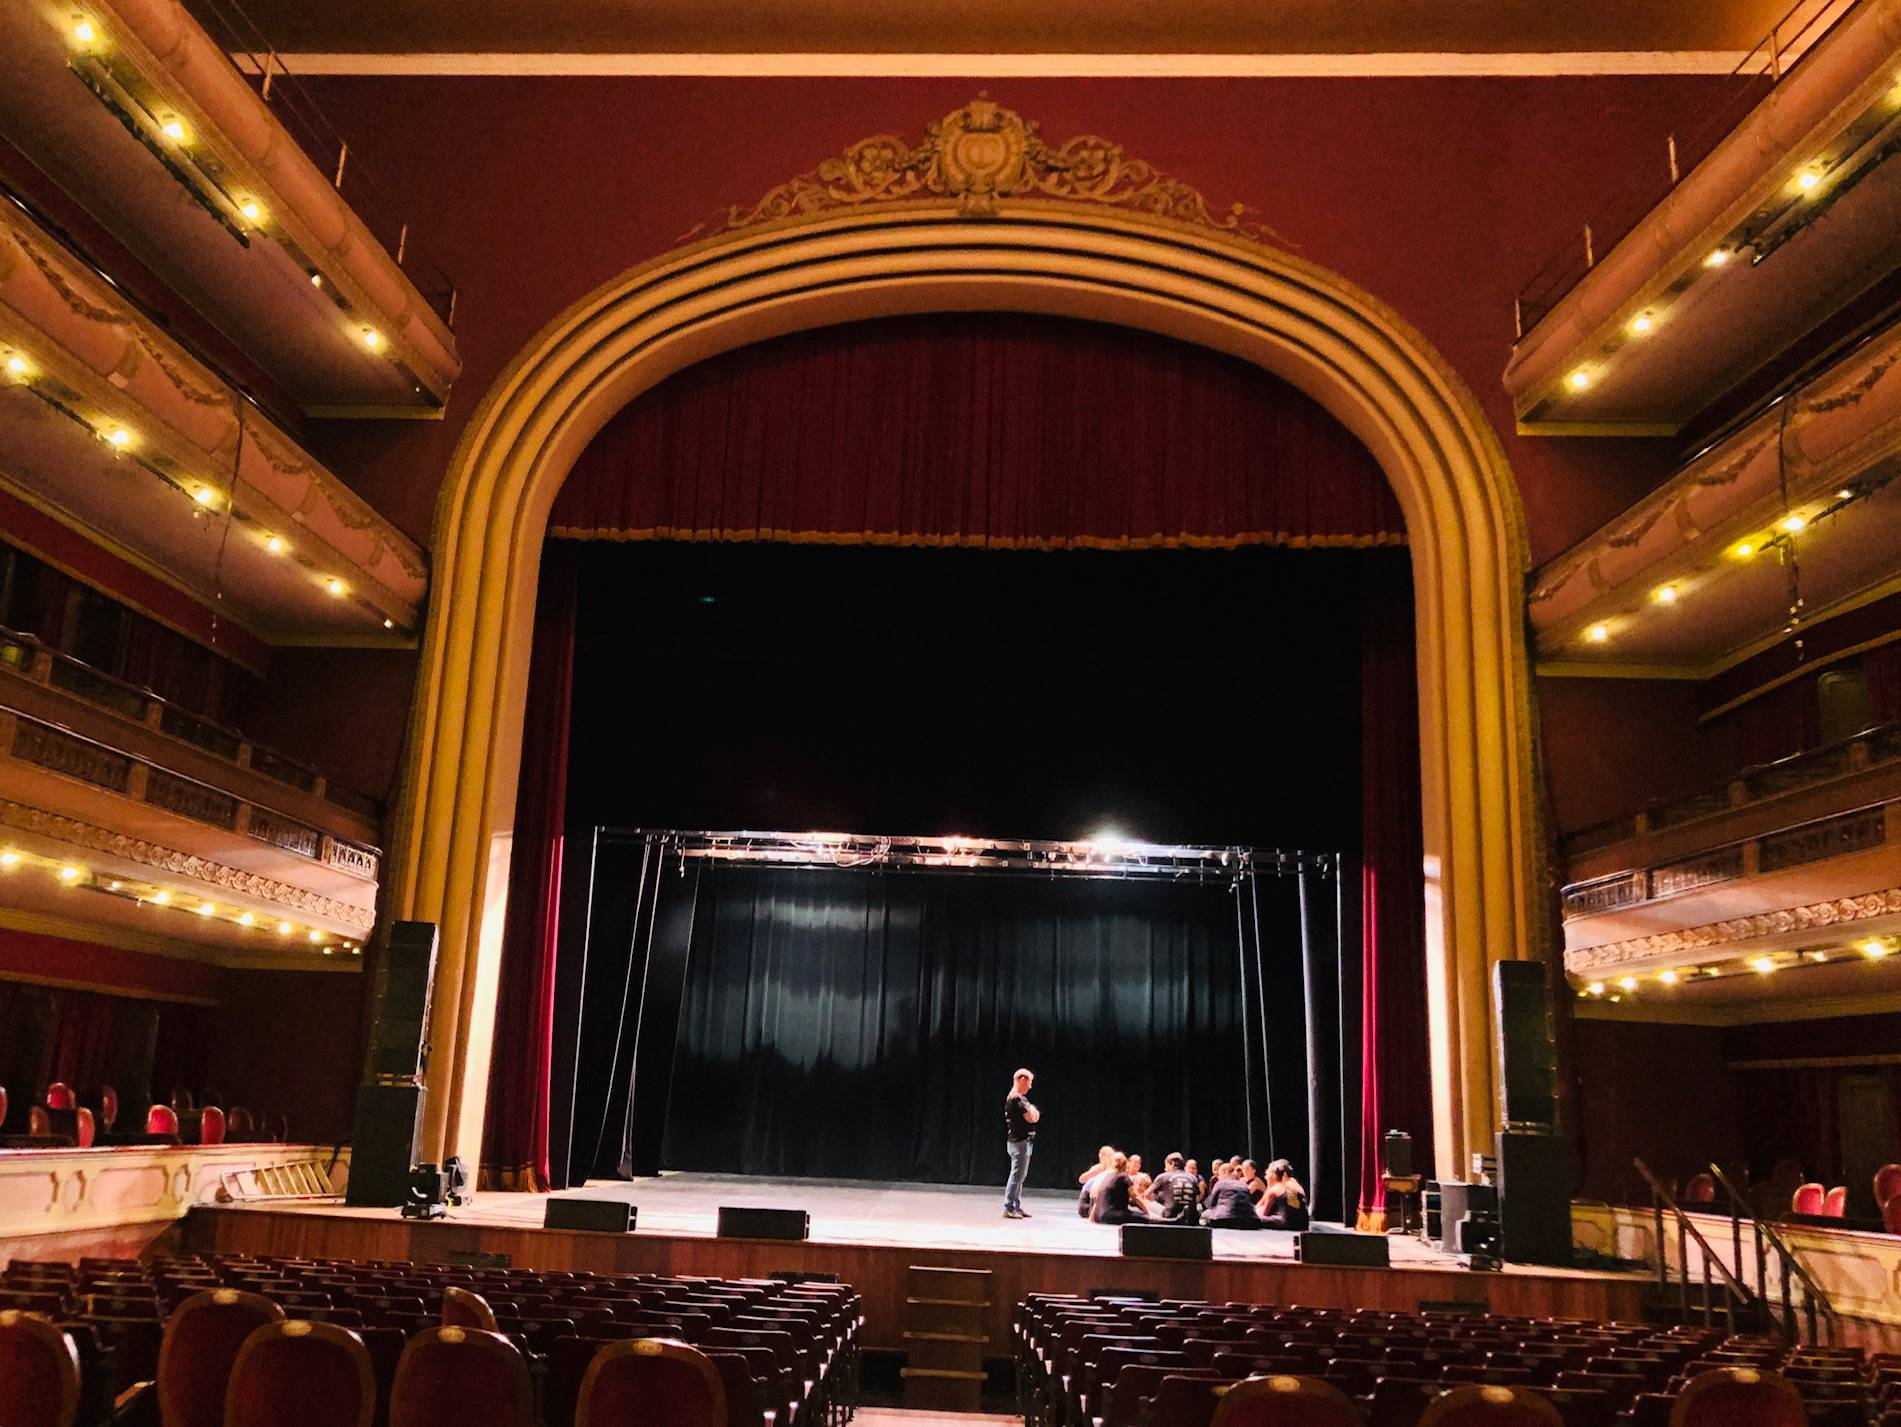 www.juicysantos.com.br- teatro coliseu de santos visto da plateia